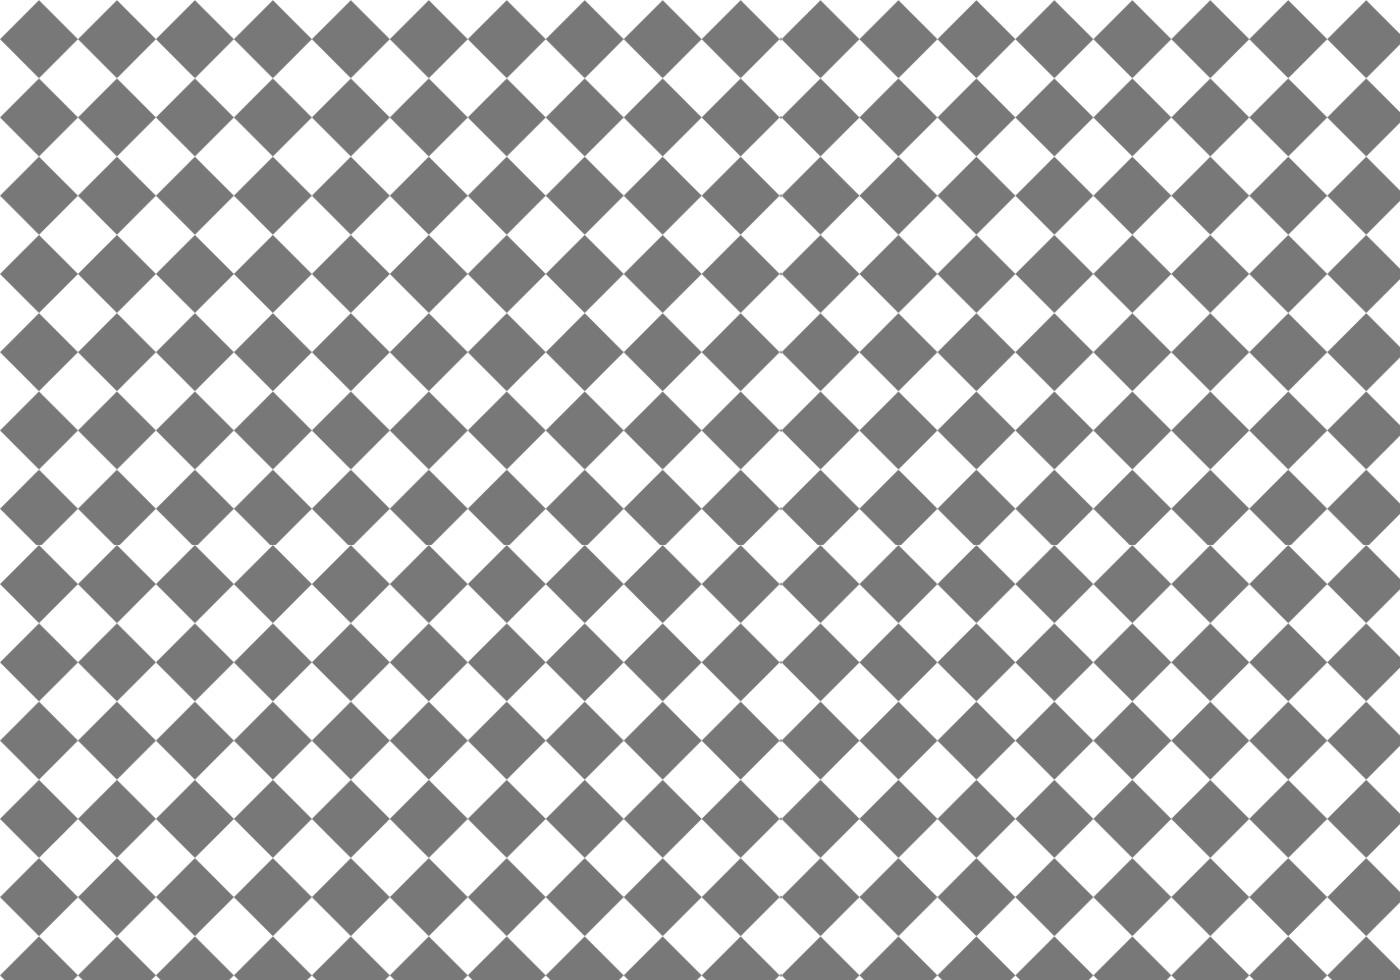 Diagonal Checkered High Quality Free Photoshop Brushes